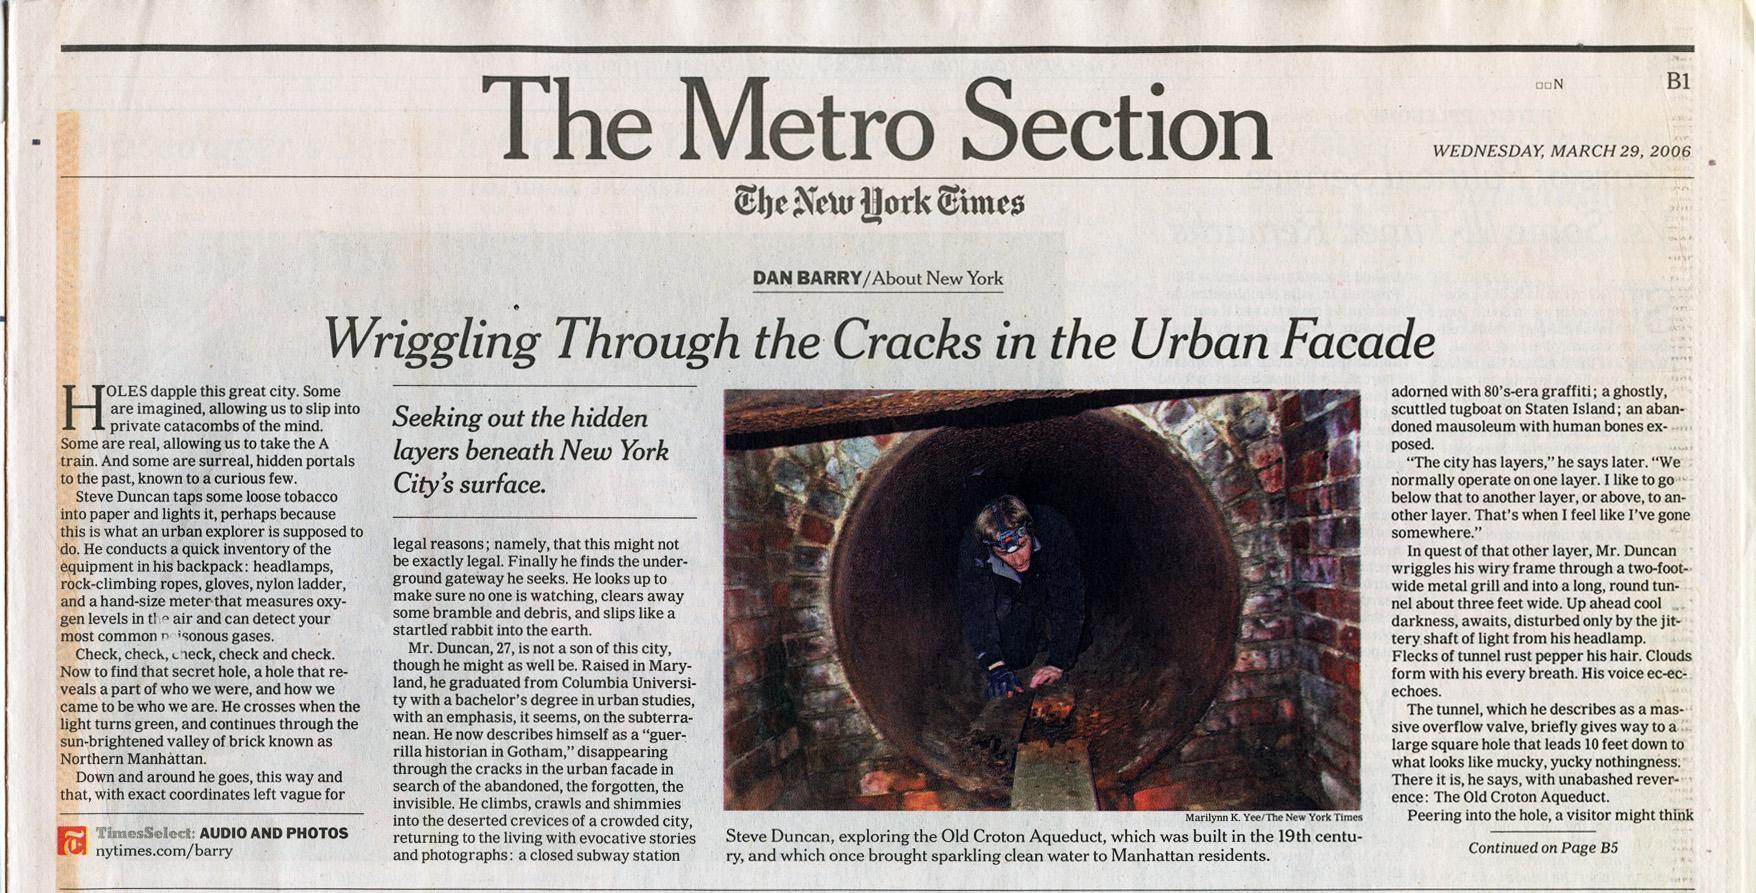 NYTimes042906_1.jpg